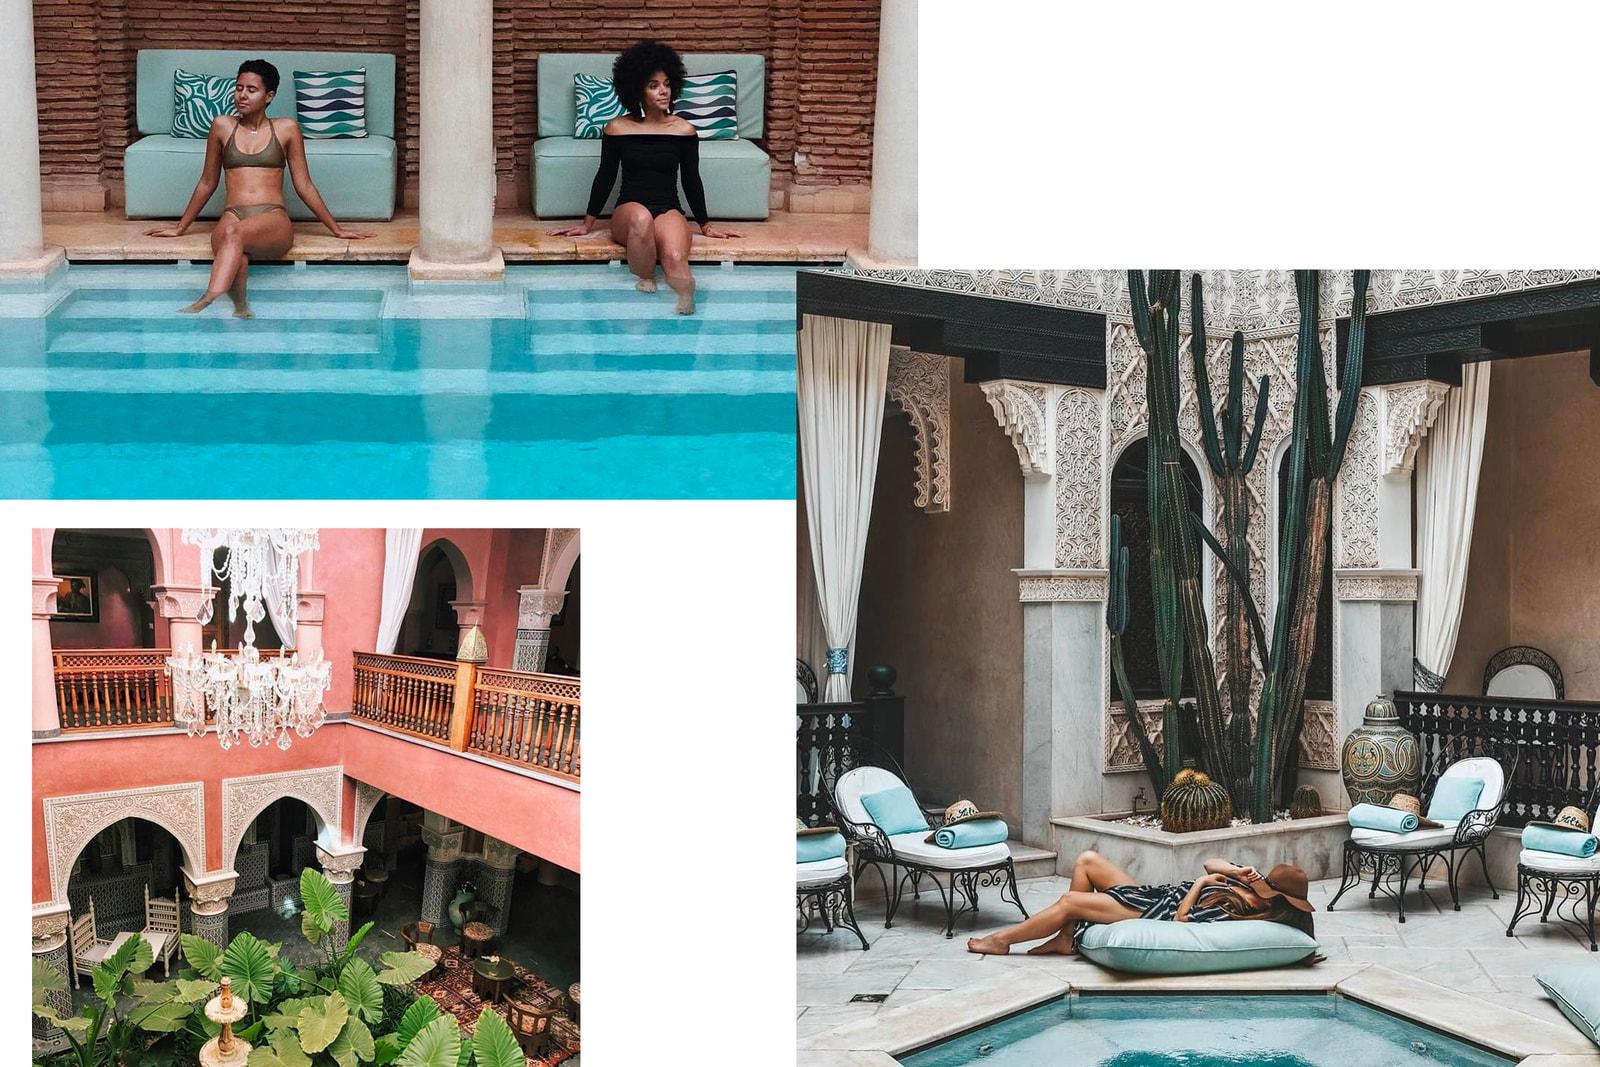 Instagrammable Hotels Instagram Worthy Travel Katamama Bali Indonesia Resort Swimming Pool